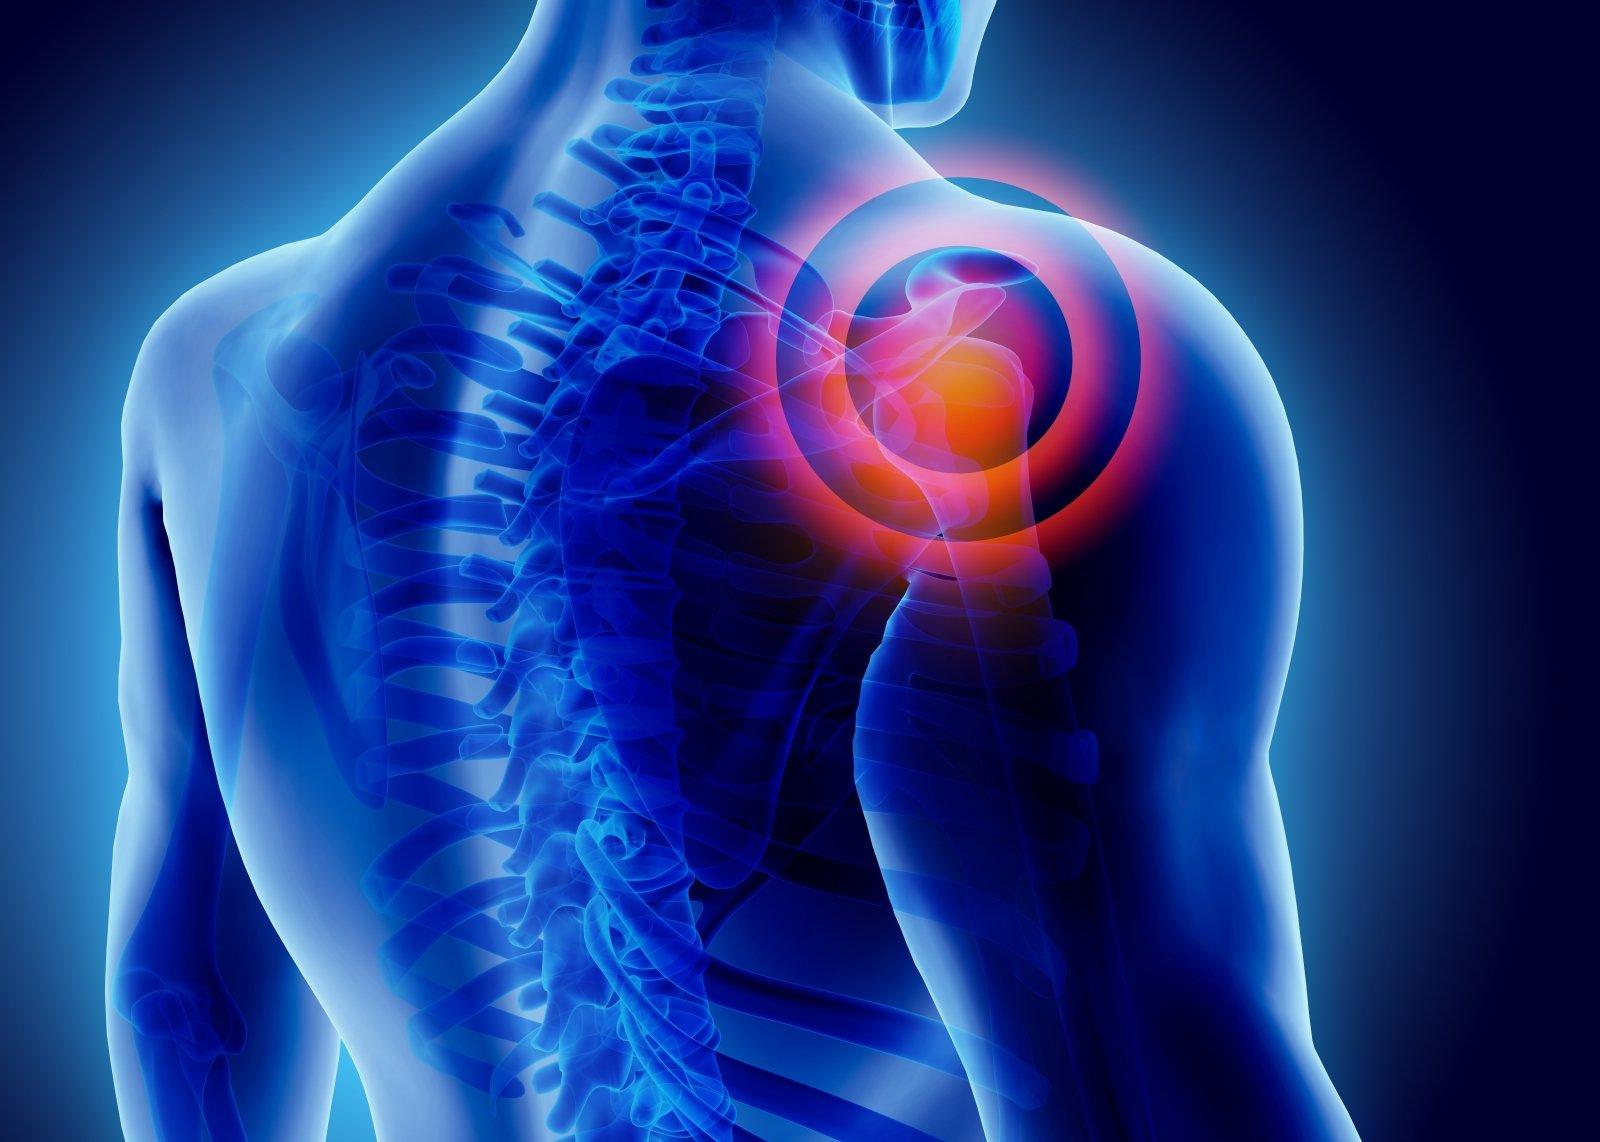 nugaros skausmai gulint